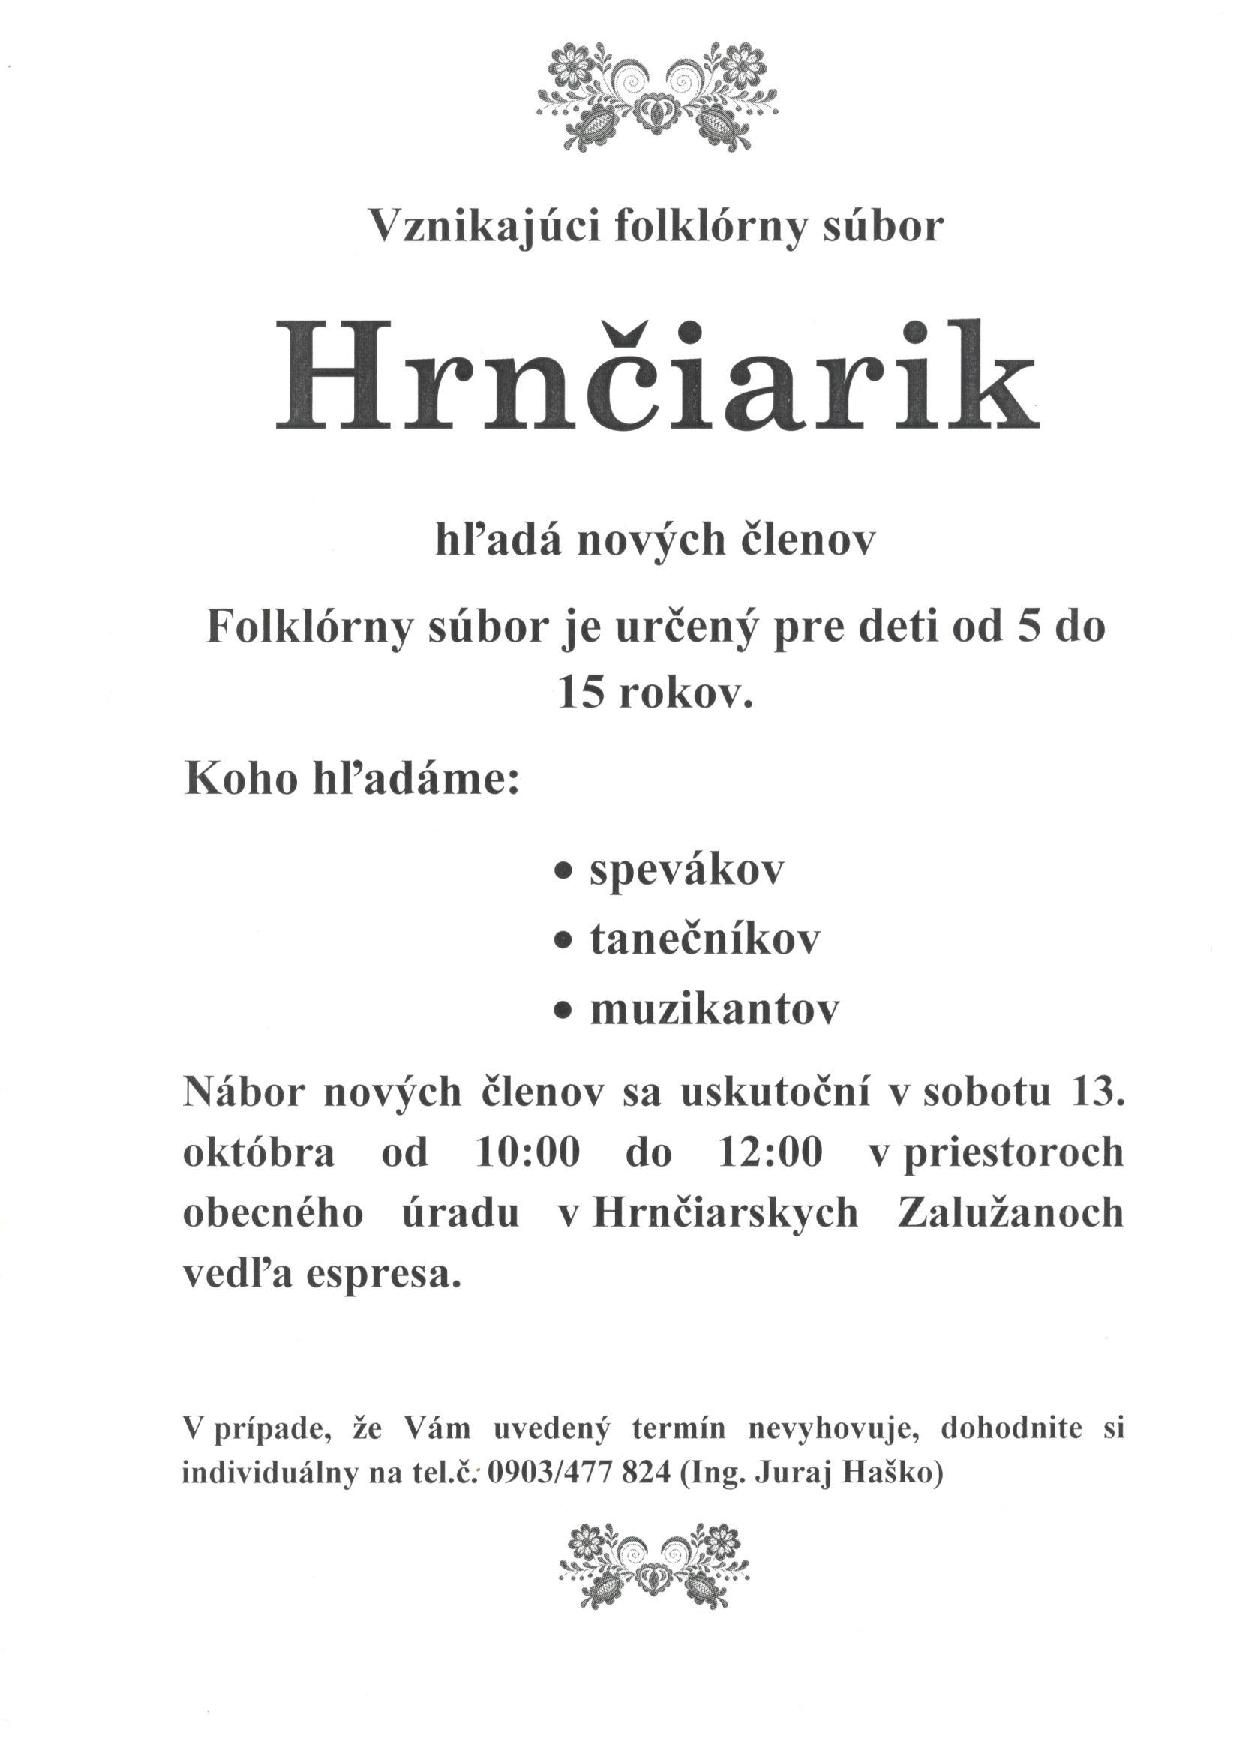 Hrnčiarik